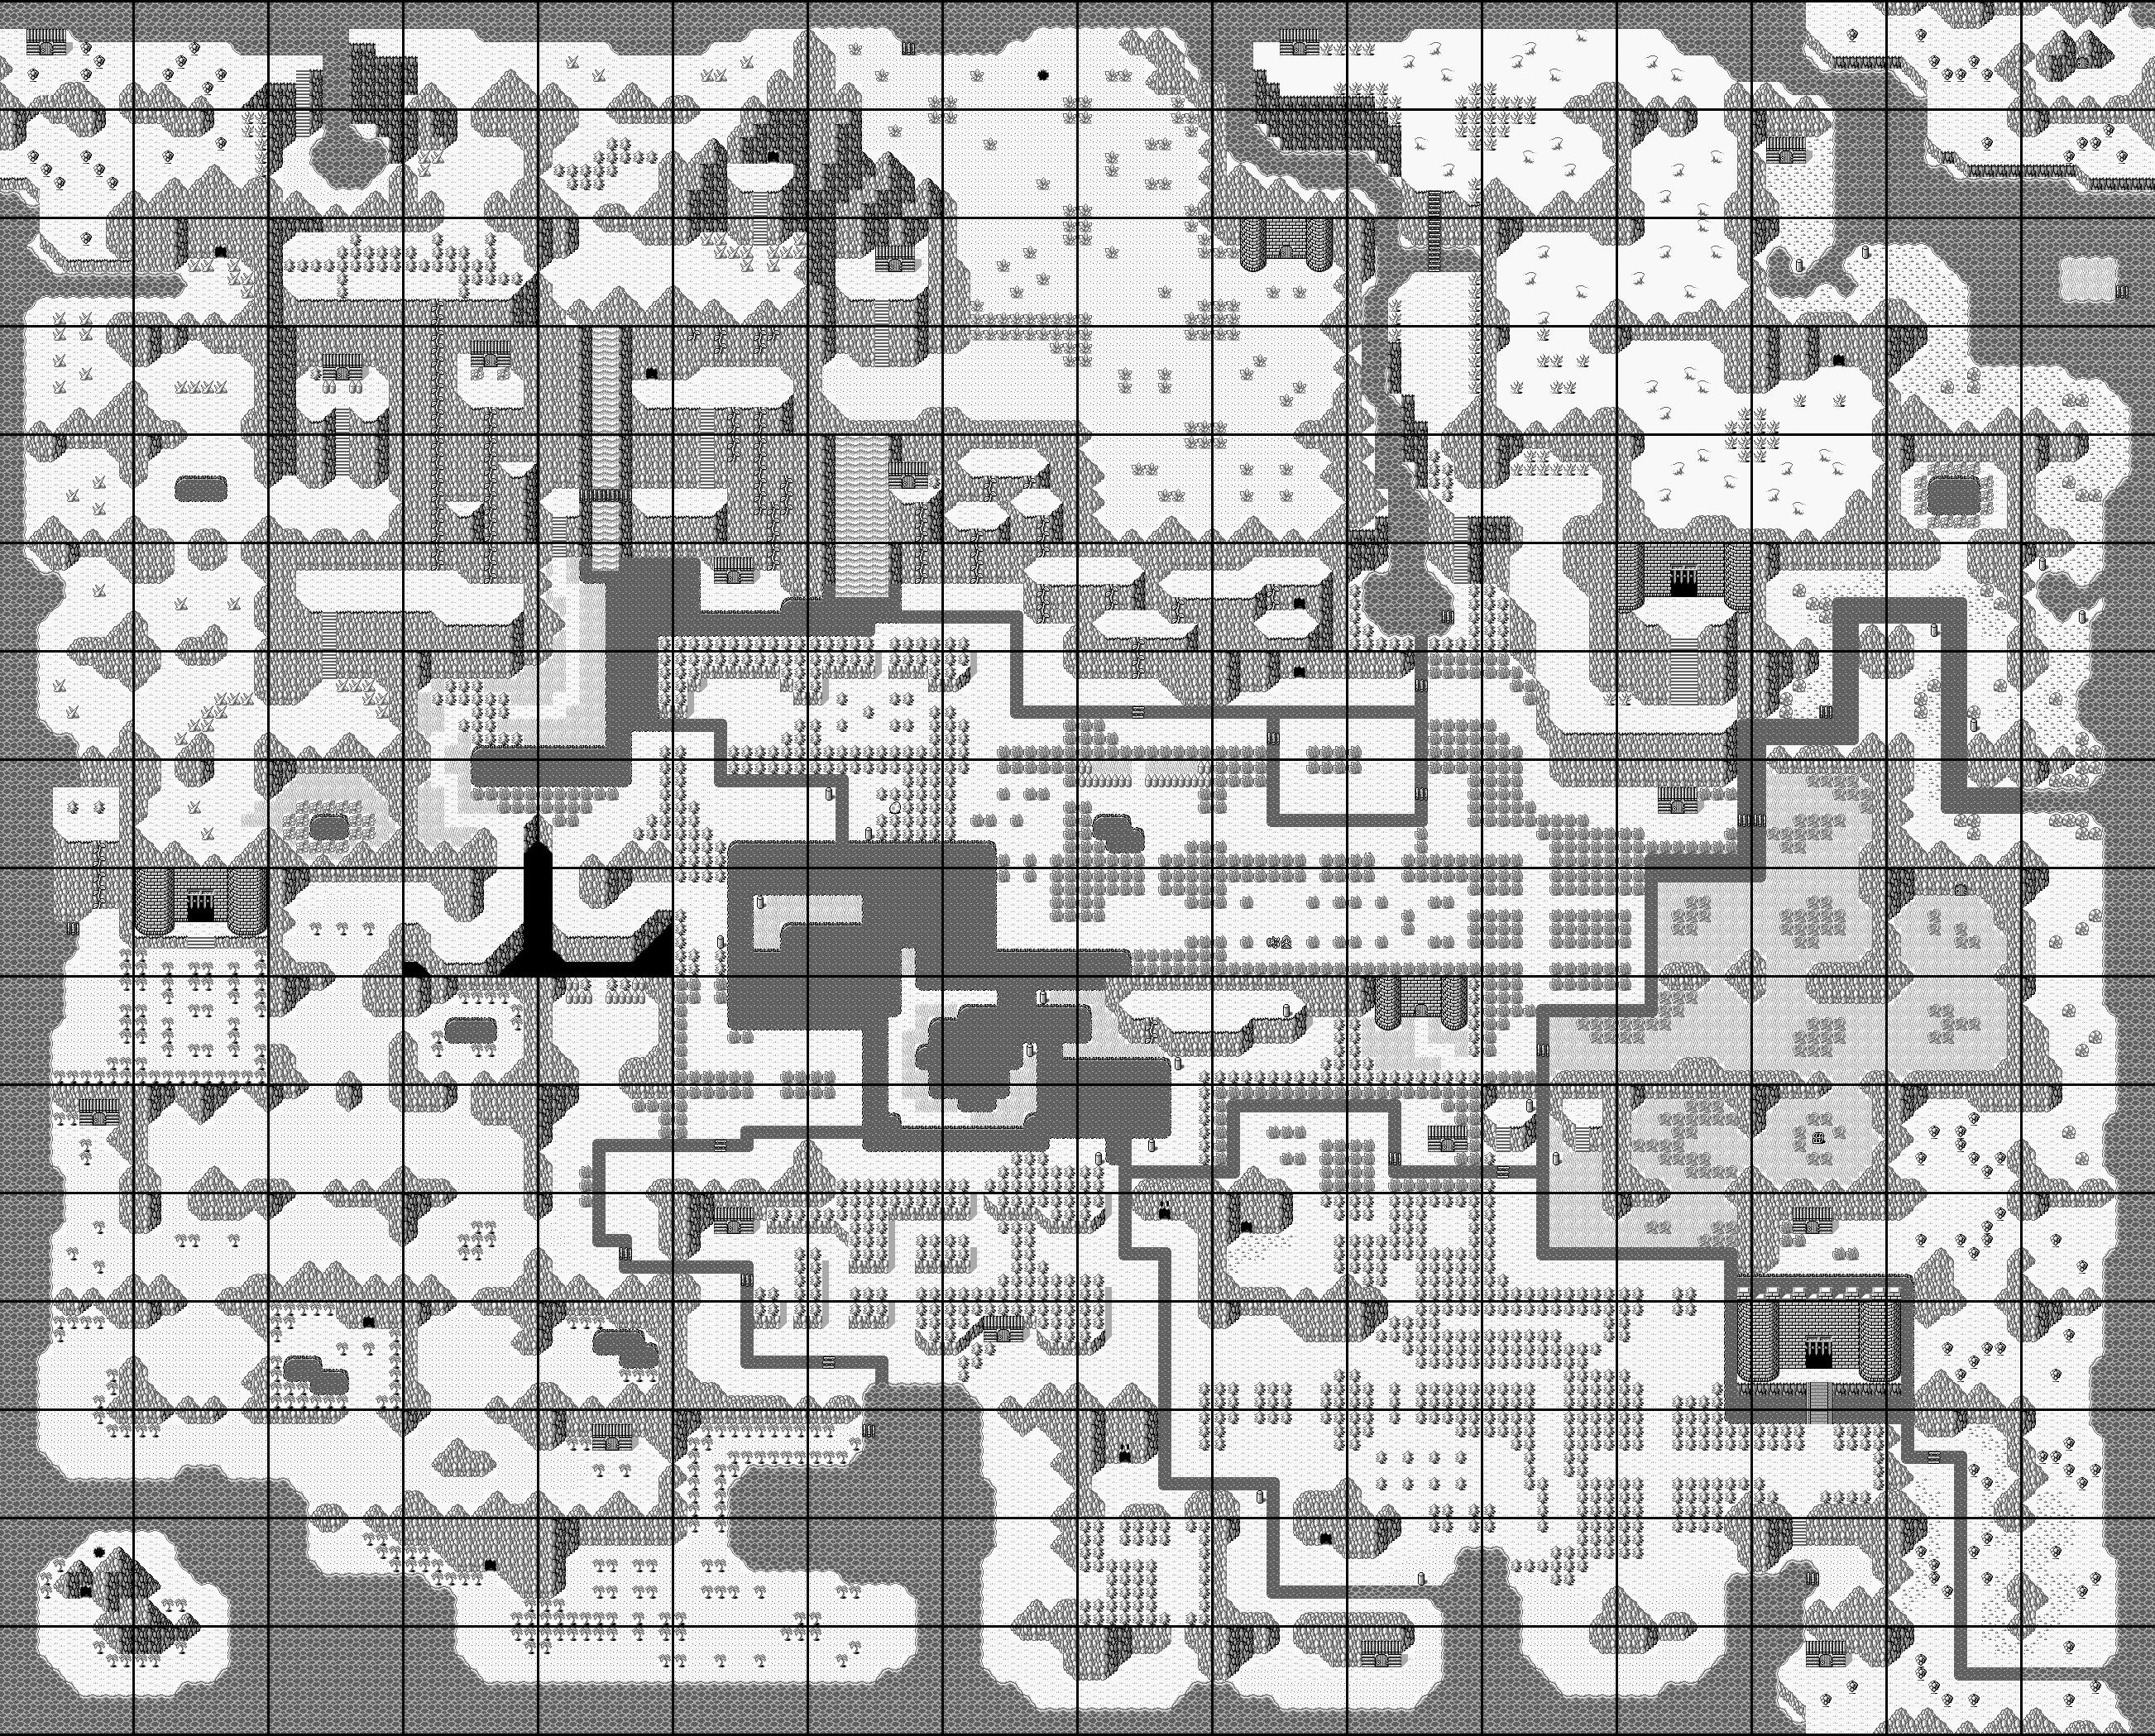 Final Fantasy Adventure Map